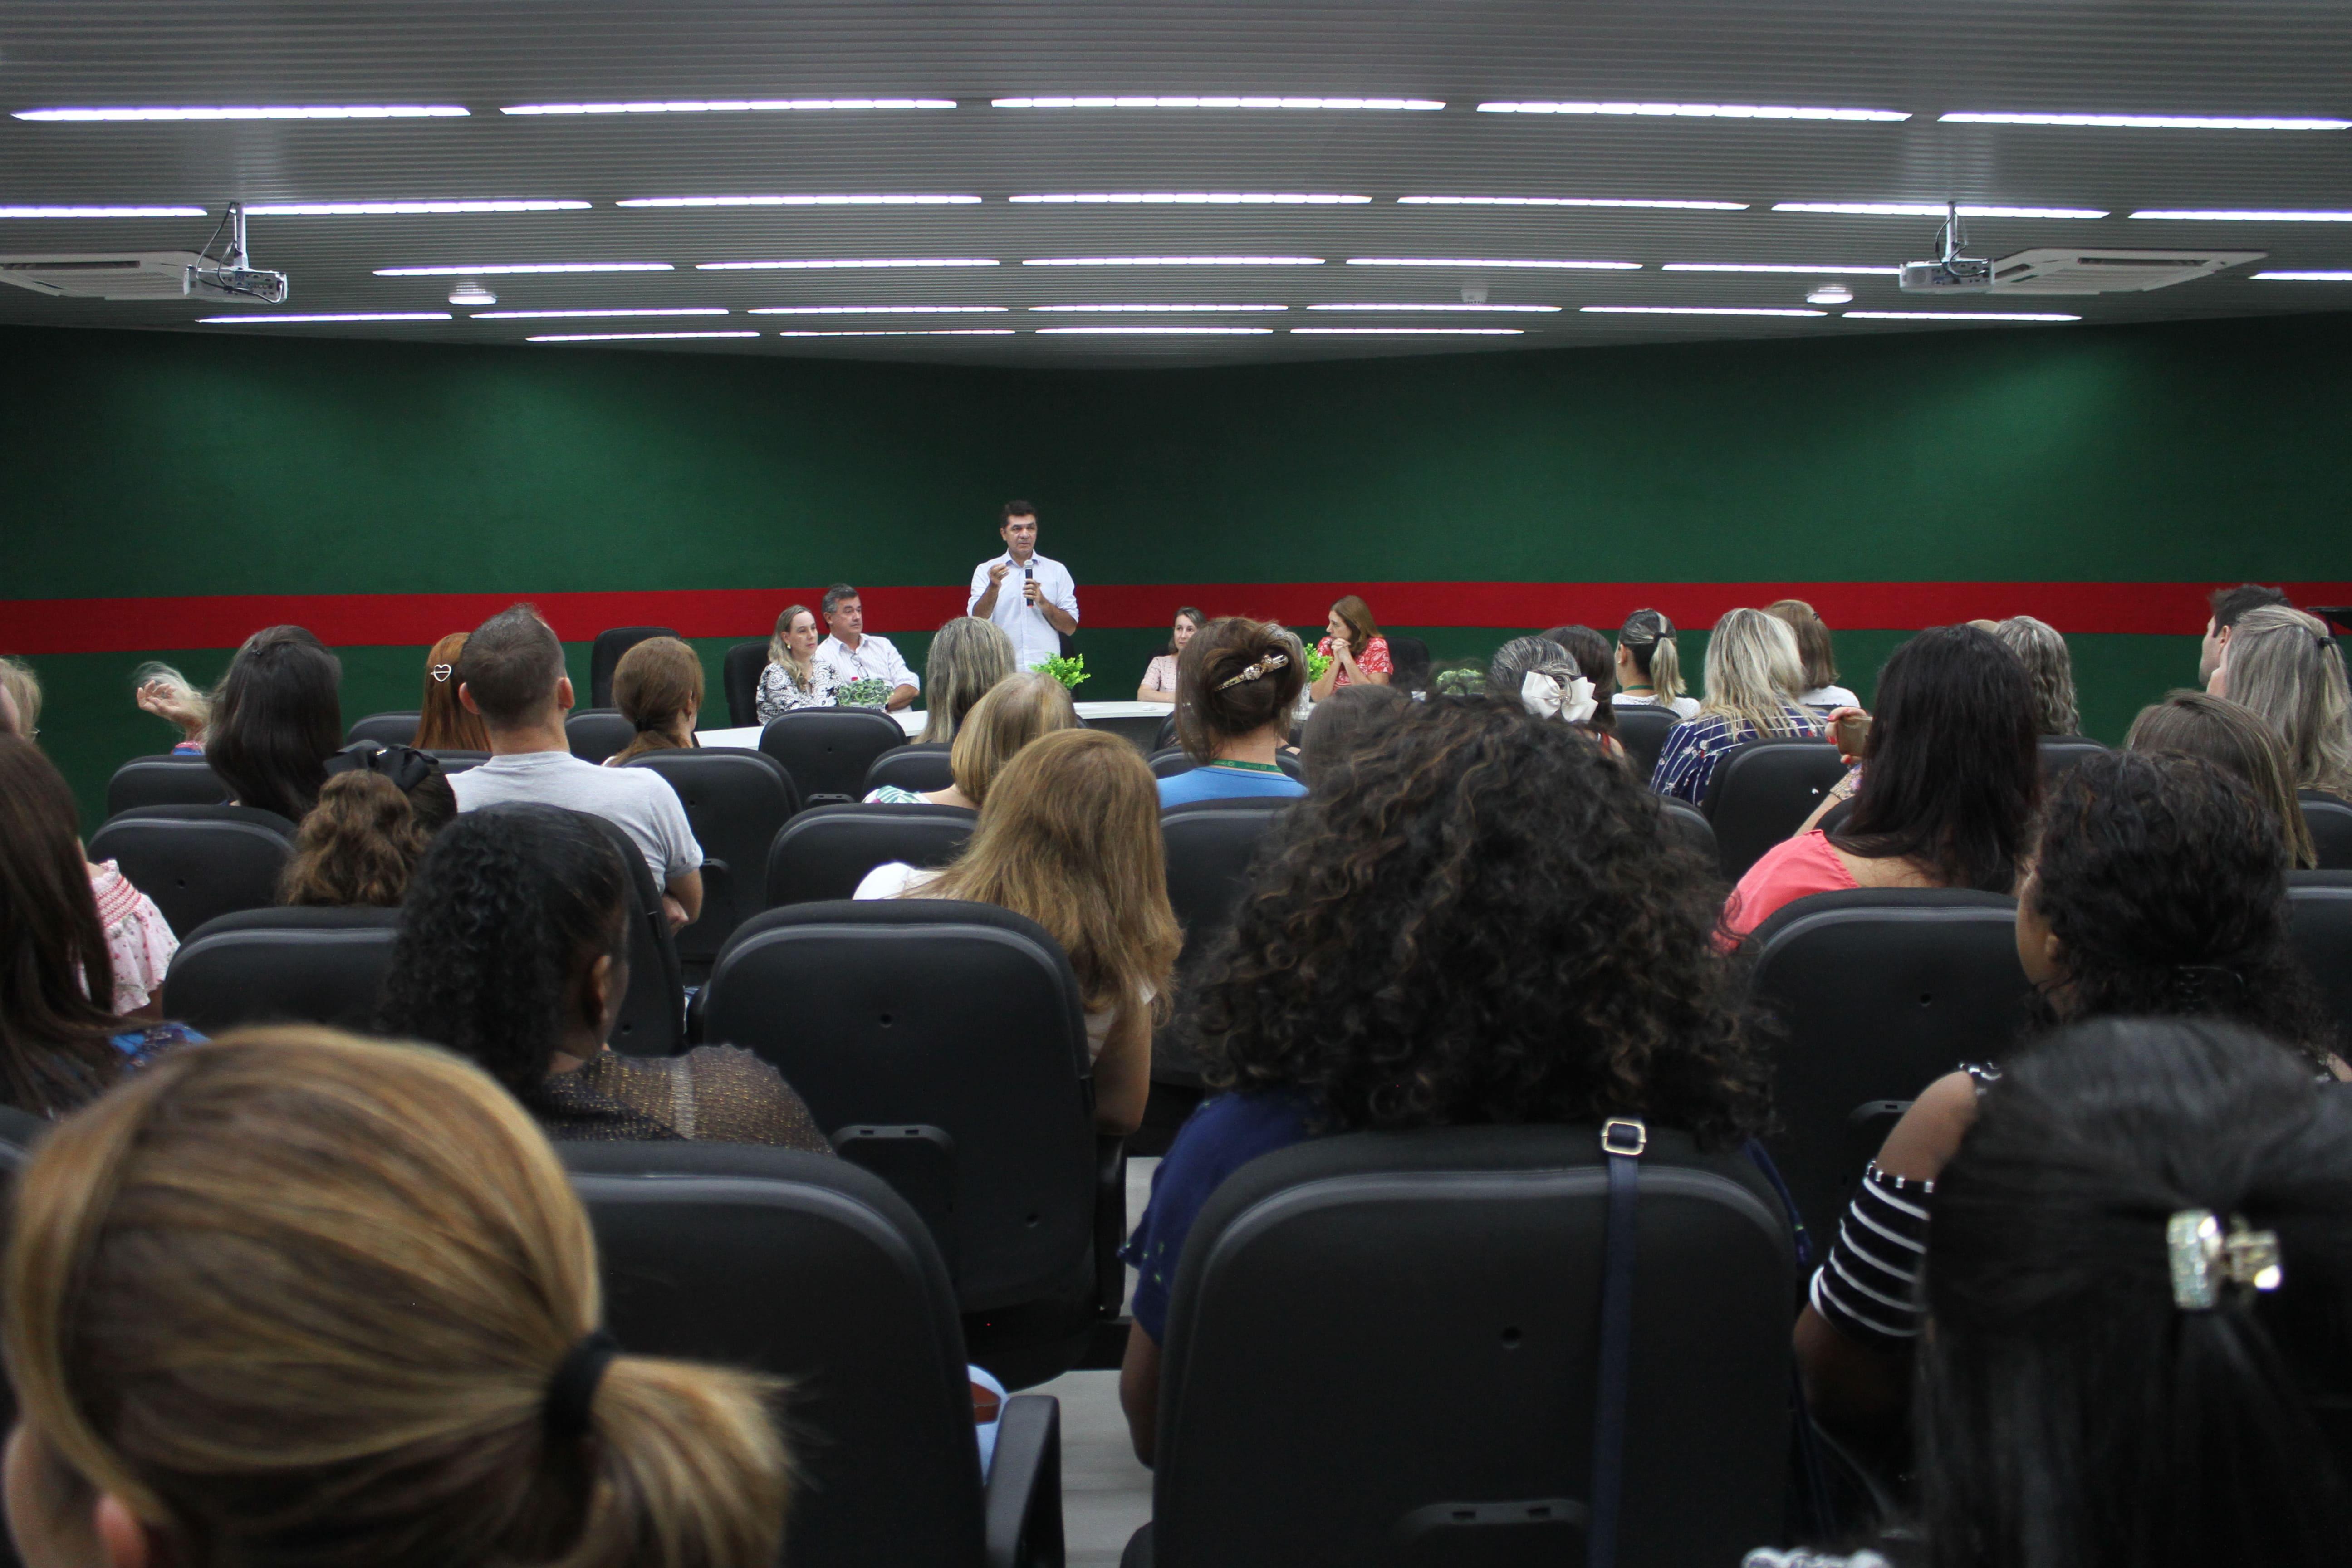 Prefeitura Municipal de Criciúma - Salvaro autoriza repasse de recurso emergencial a escolas do município